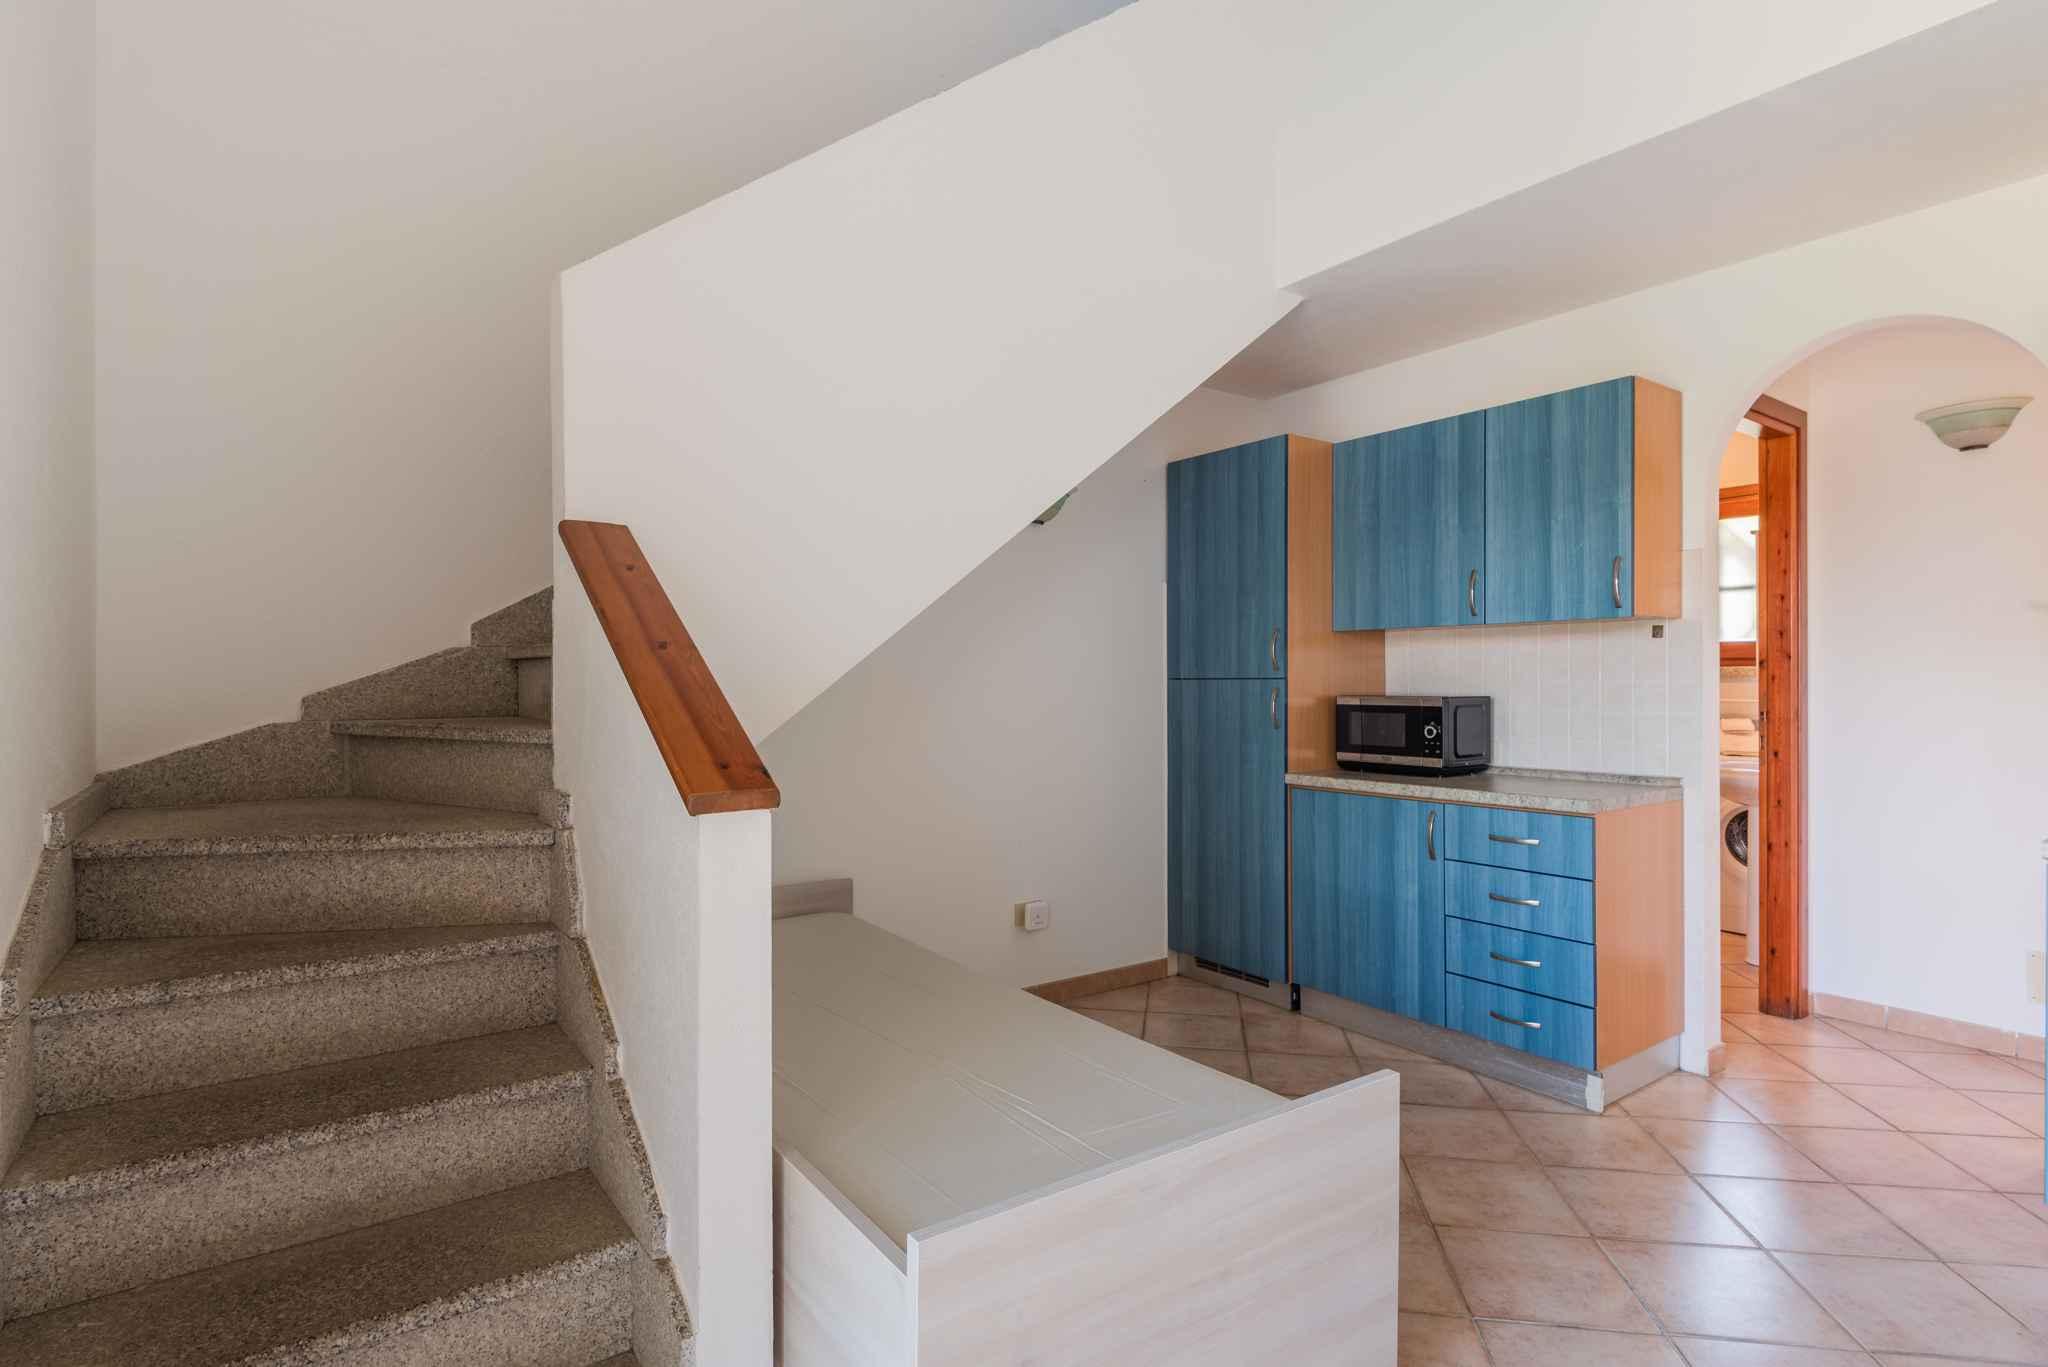 Ferienwohnung Appartamento 6 persone (2853261), Budoni, Olbia-Tempio, Sardinien, Italien, Bild 9